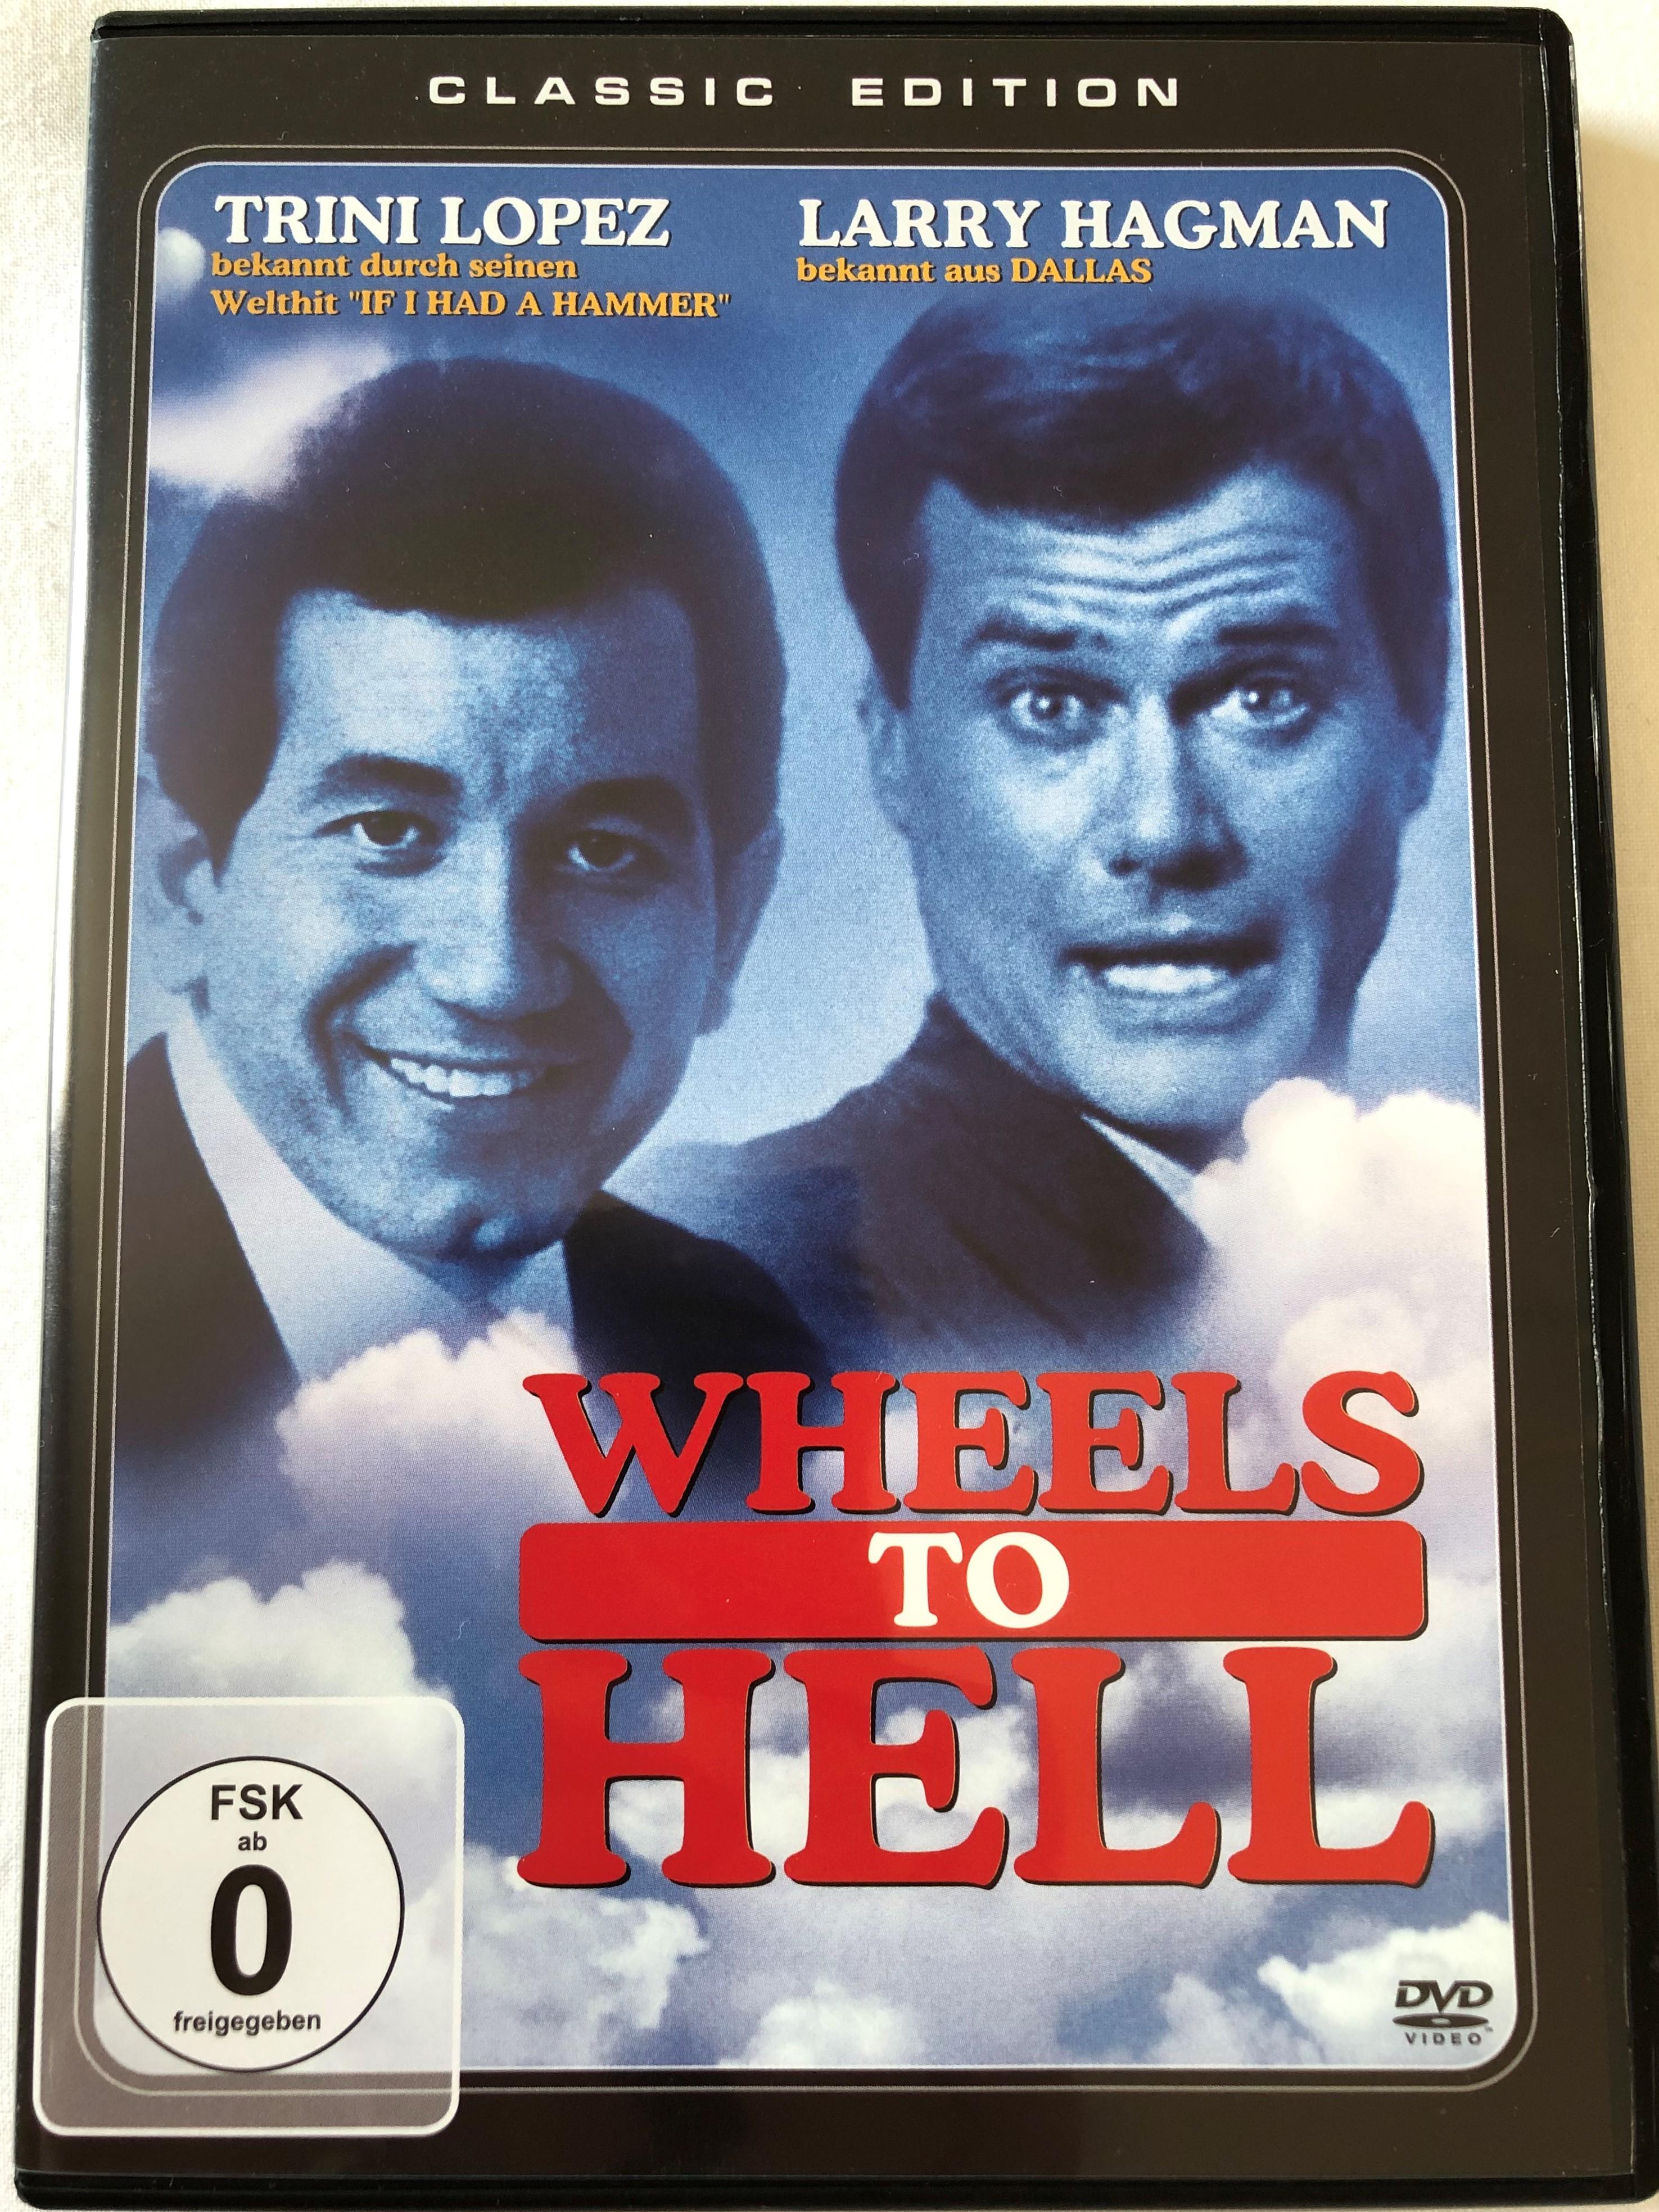 wheels-to-hell-dvd-1973-zwei-himmlische-schlitzohren-aka-antonio-directed-by-claudio-guzman-starring-trini-lopez-larry-hagman-classic-edition-1-.jpg